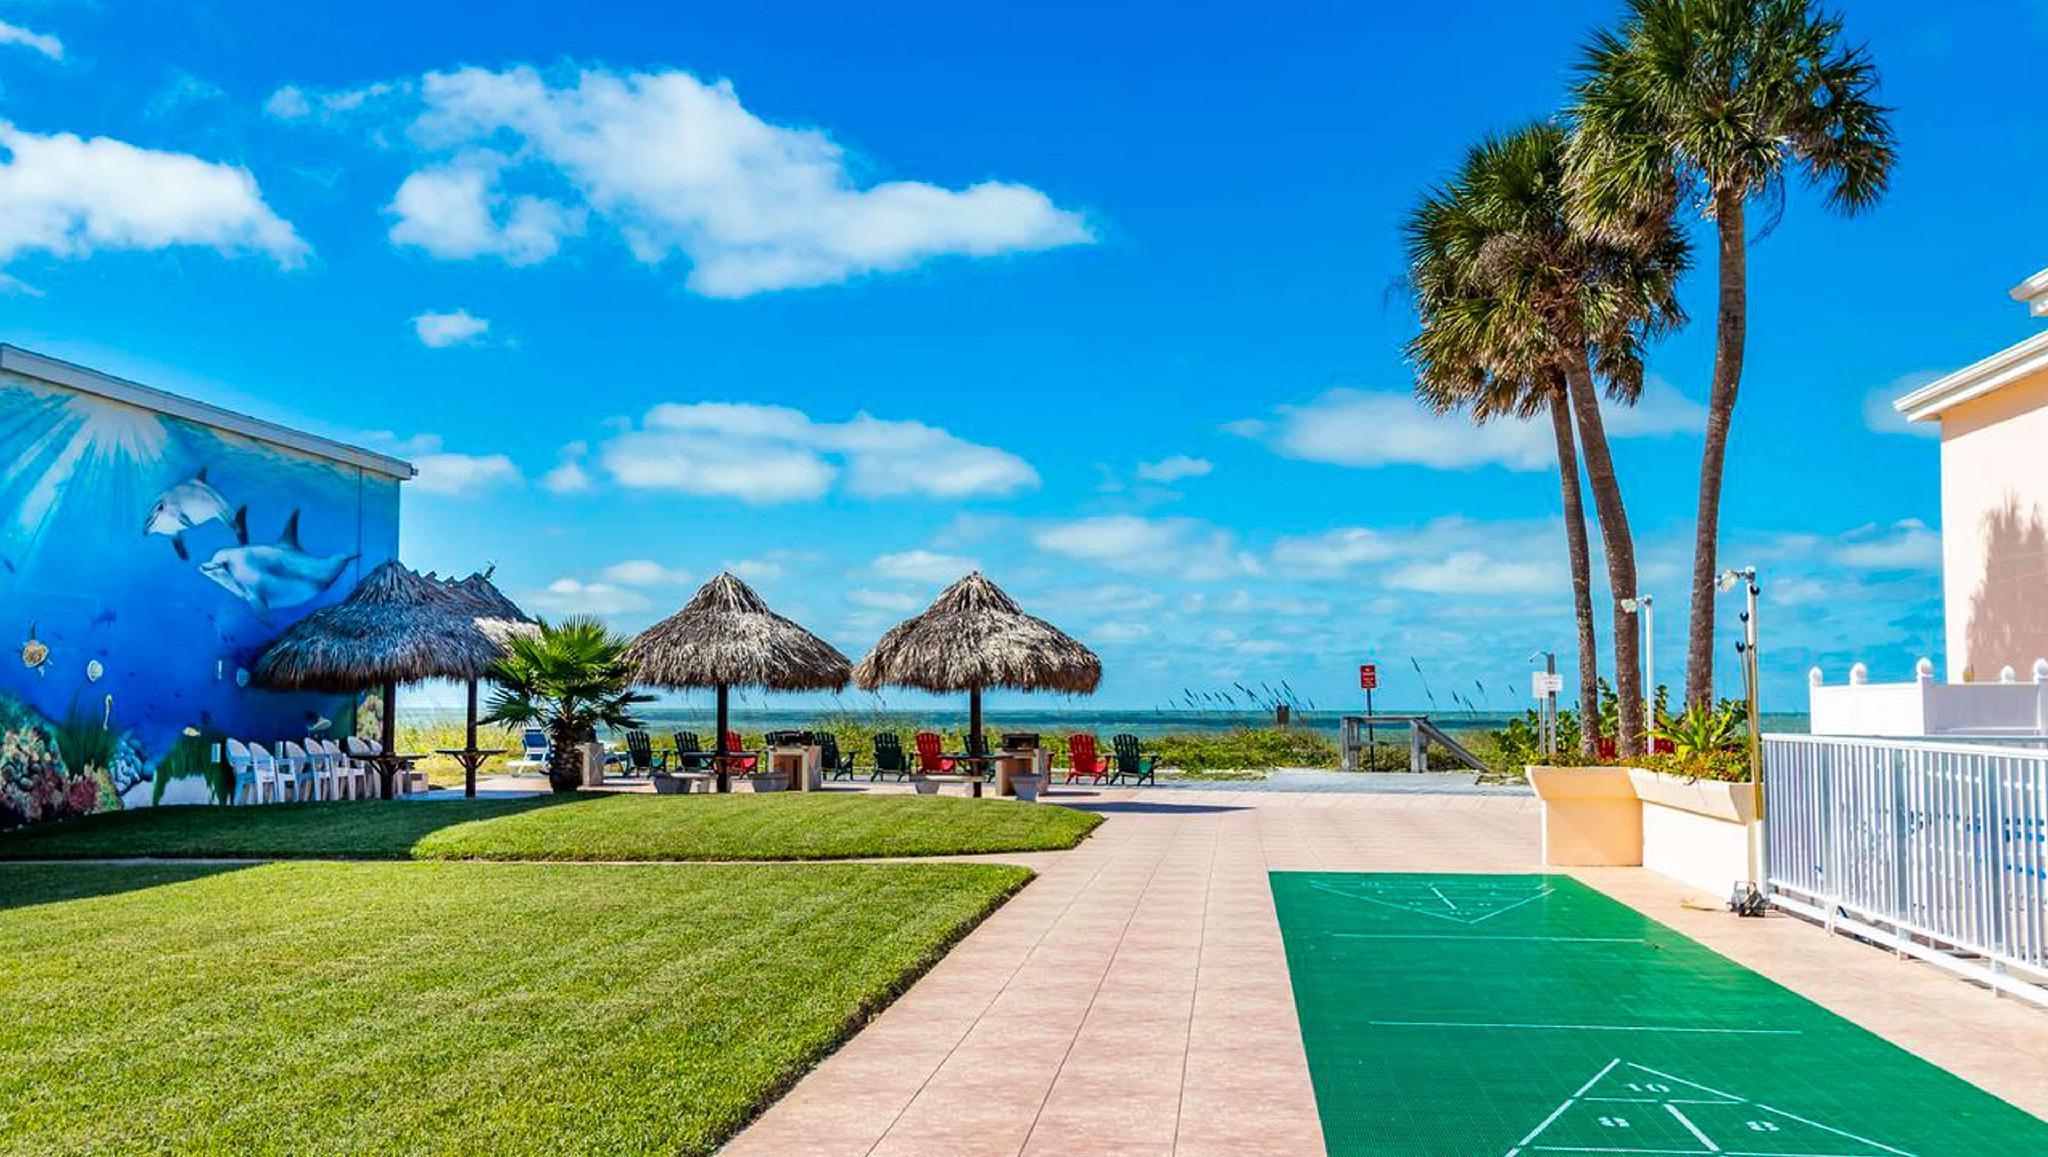 Belleair Beach Resort Motel By Magnuson Worldwide